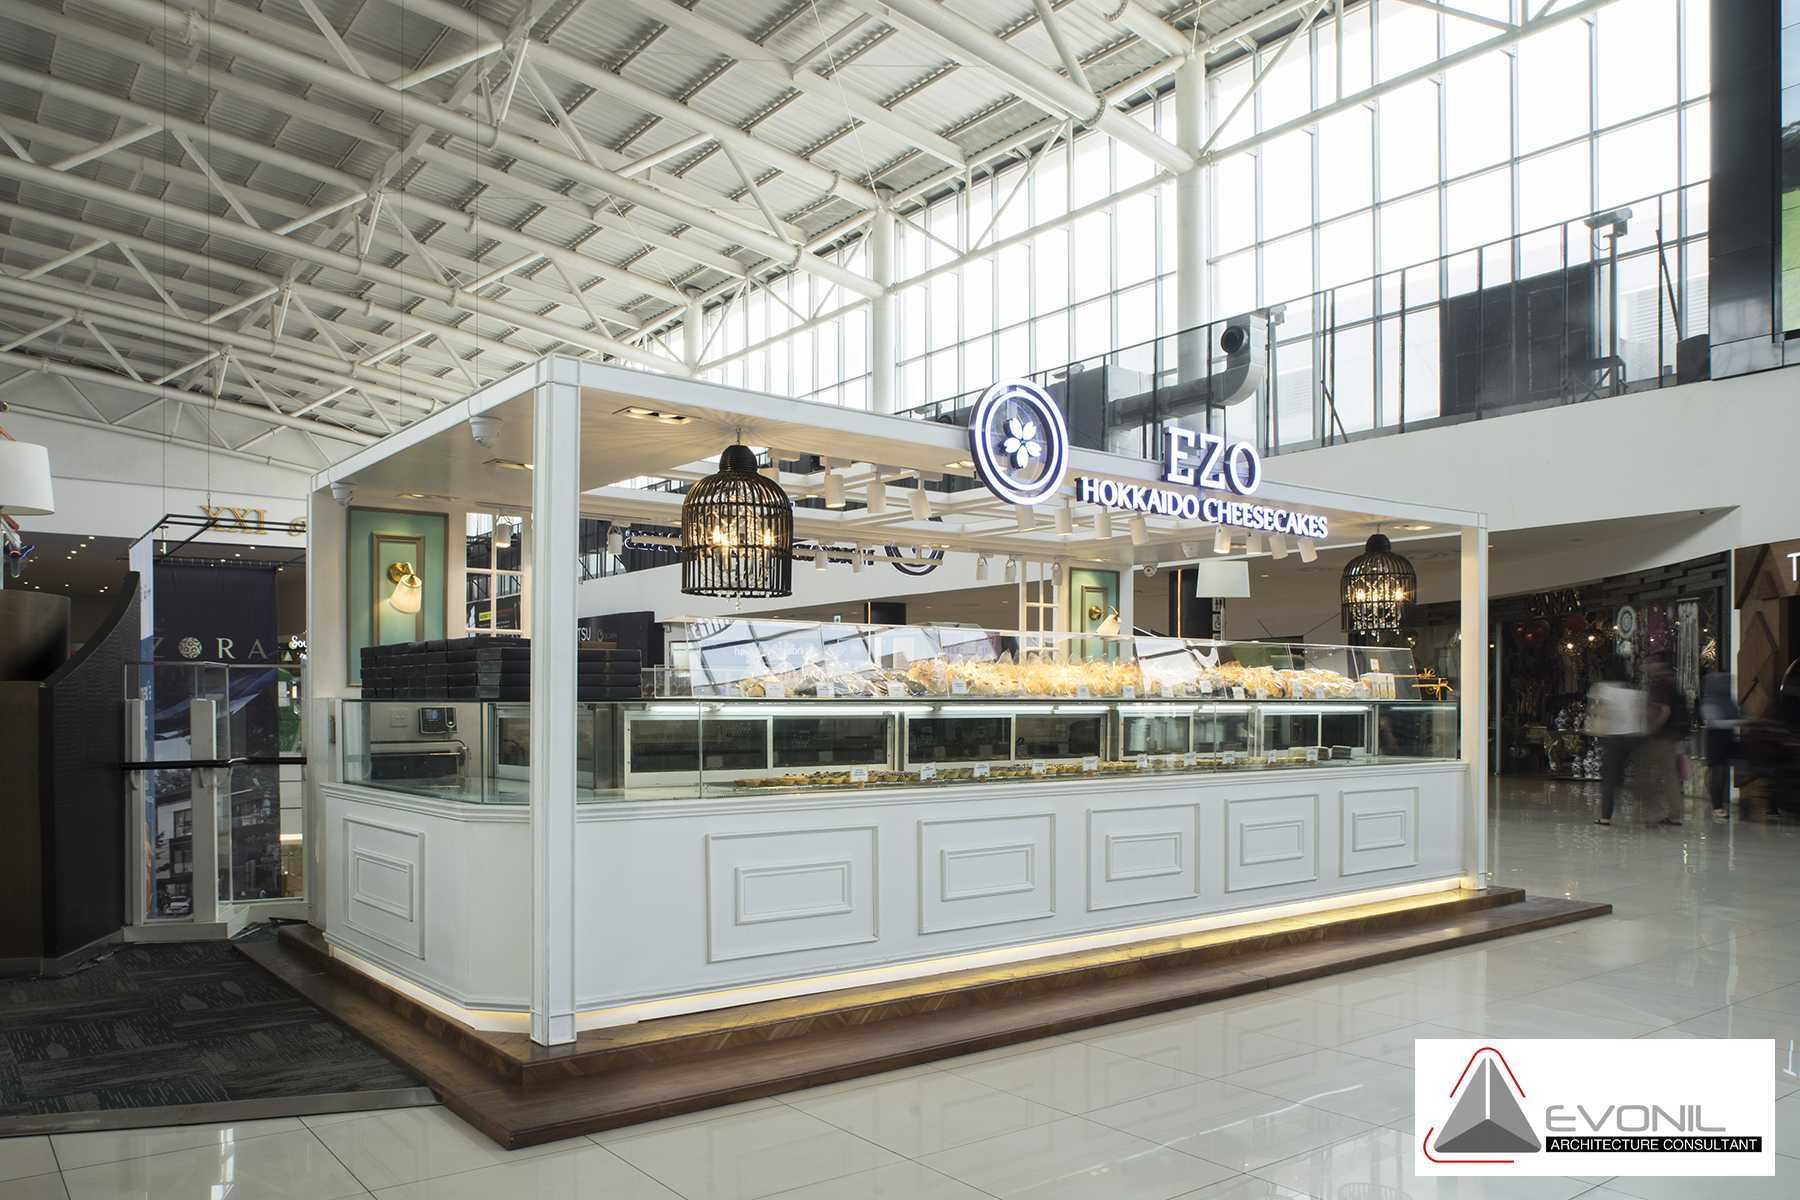 Evonil Architecture Ezo Cheesecakes Bakery - Mall Aeon Bsd Tangerang, Kota Tangerang, Banten, Indonesia Tangerang, Kota Tangerang, Banten, Indonesia Evonil-Architecture-Ezo-Cheesecakes-Bakery-Mall-Aeon-Bsd   59573